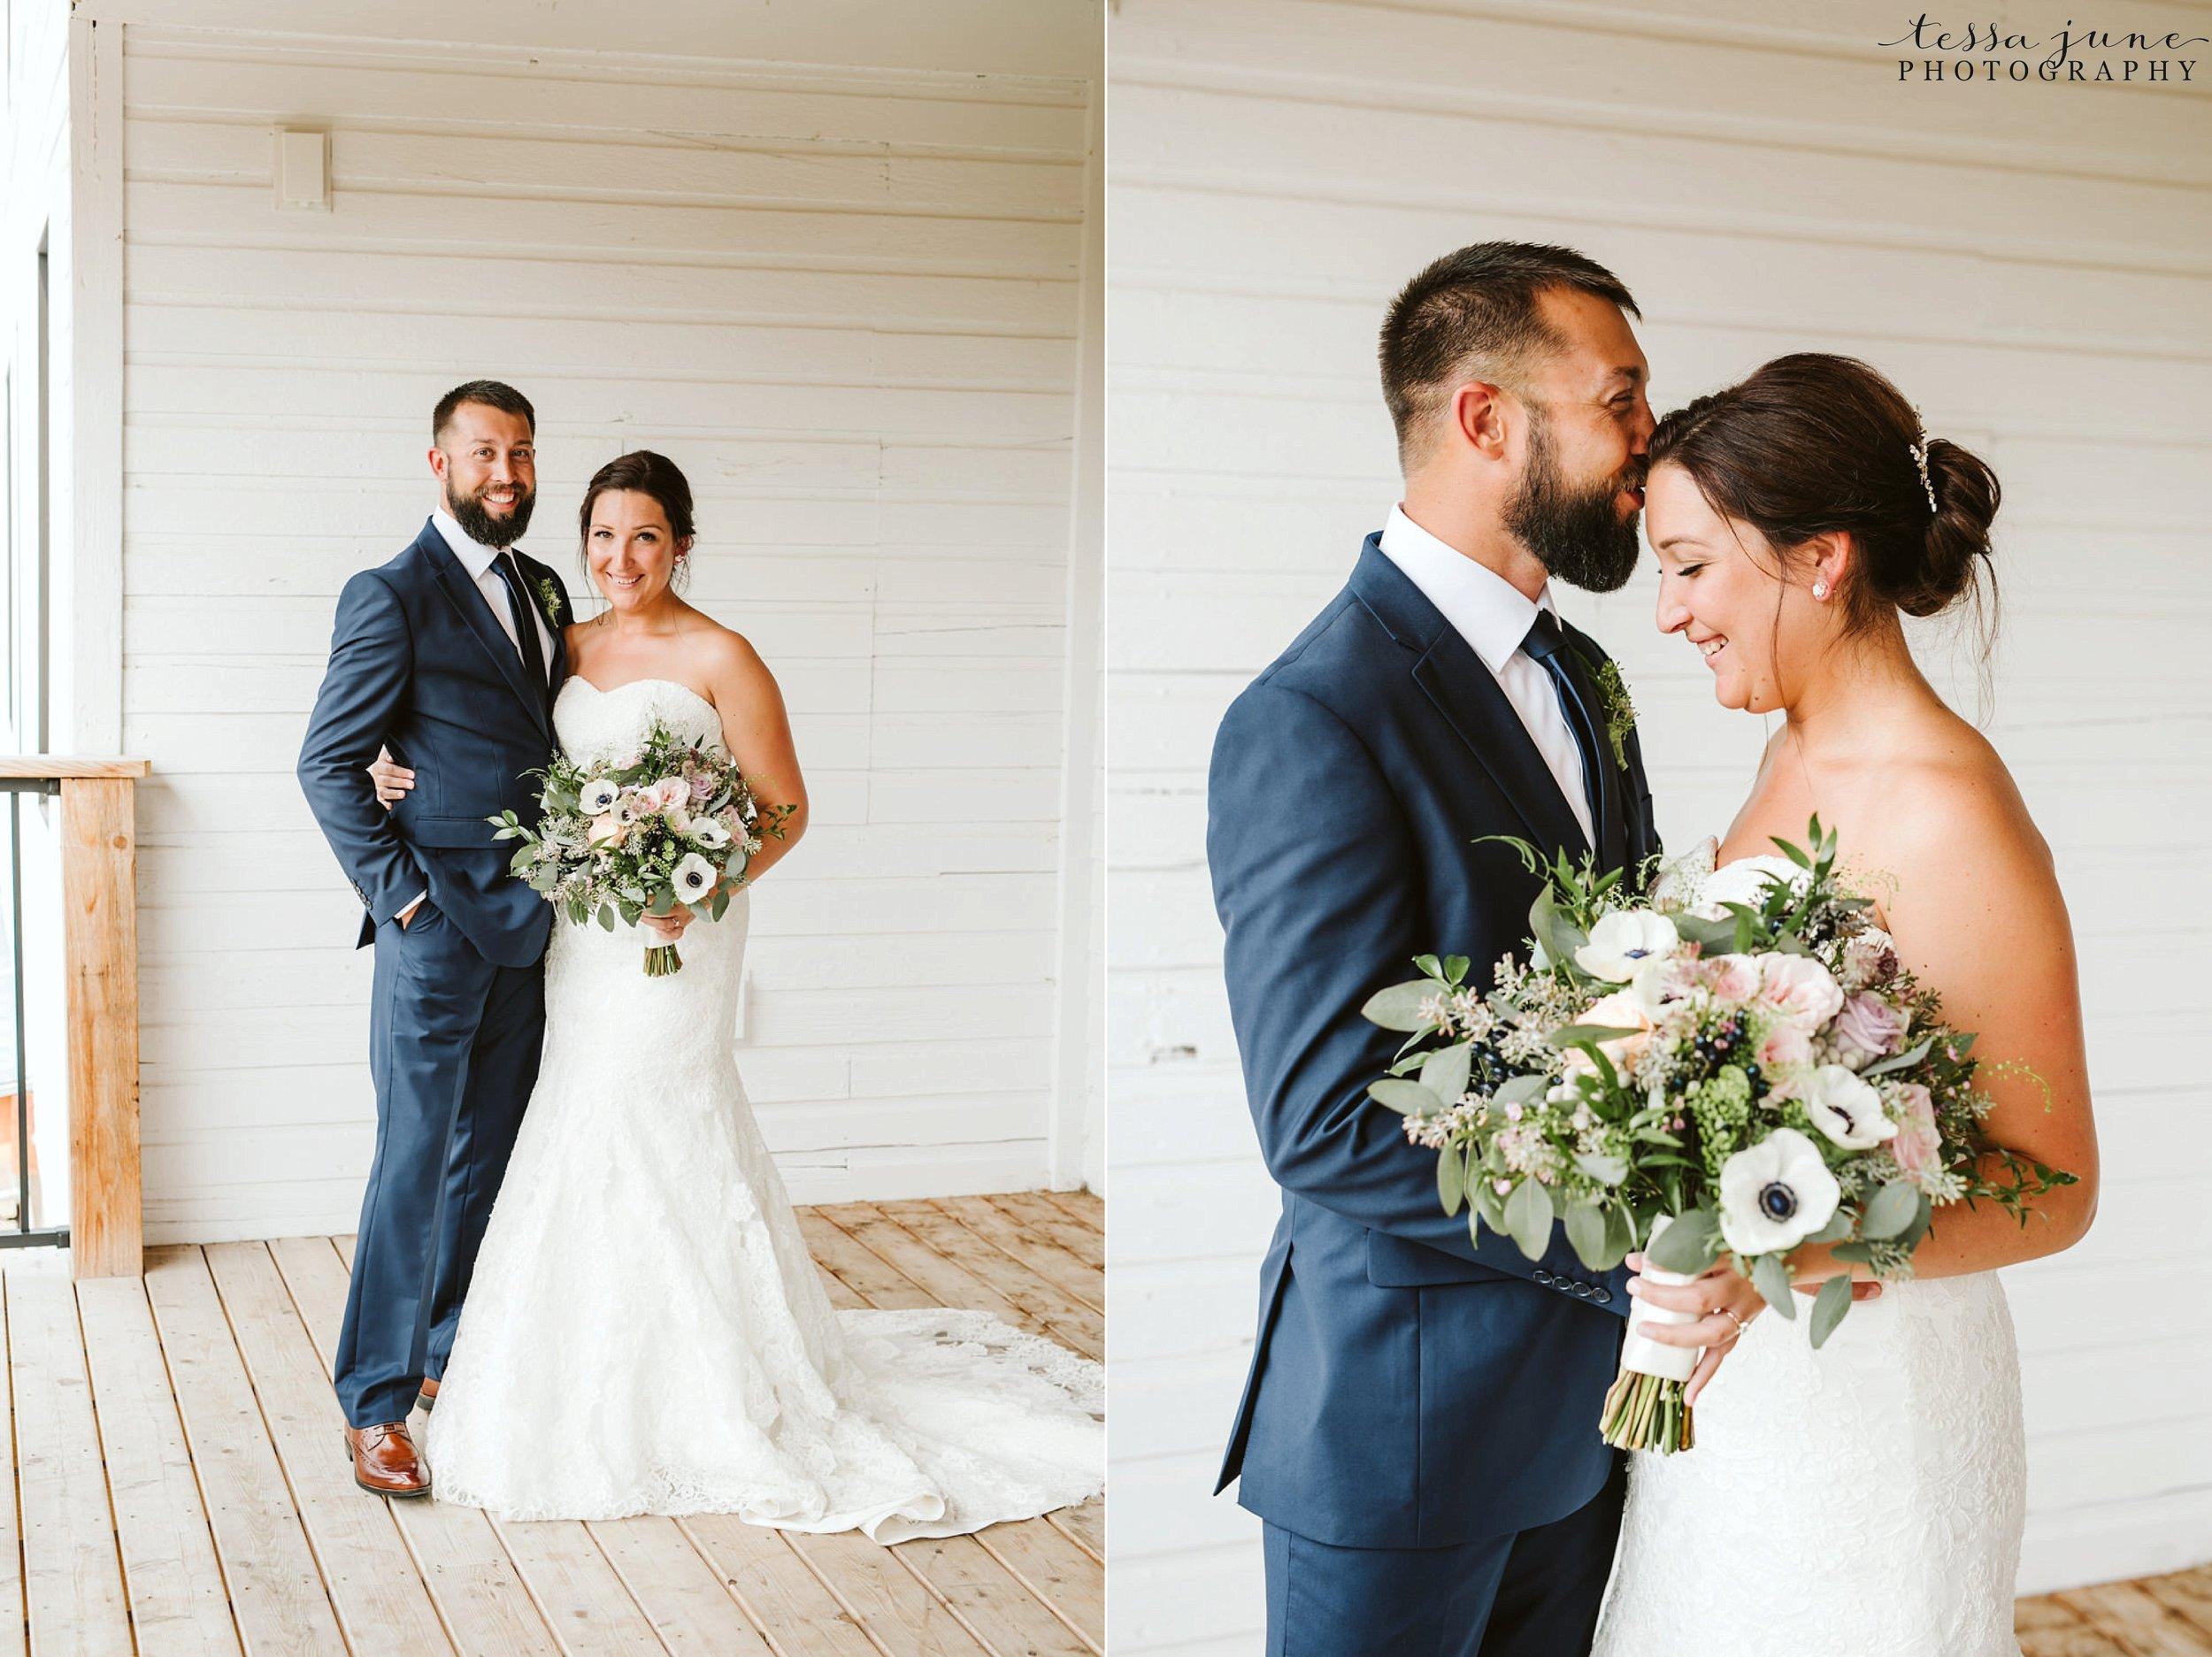 gathered-oaks-barn-wedding-alexandria-minnesota-24.jpg